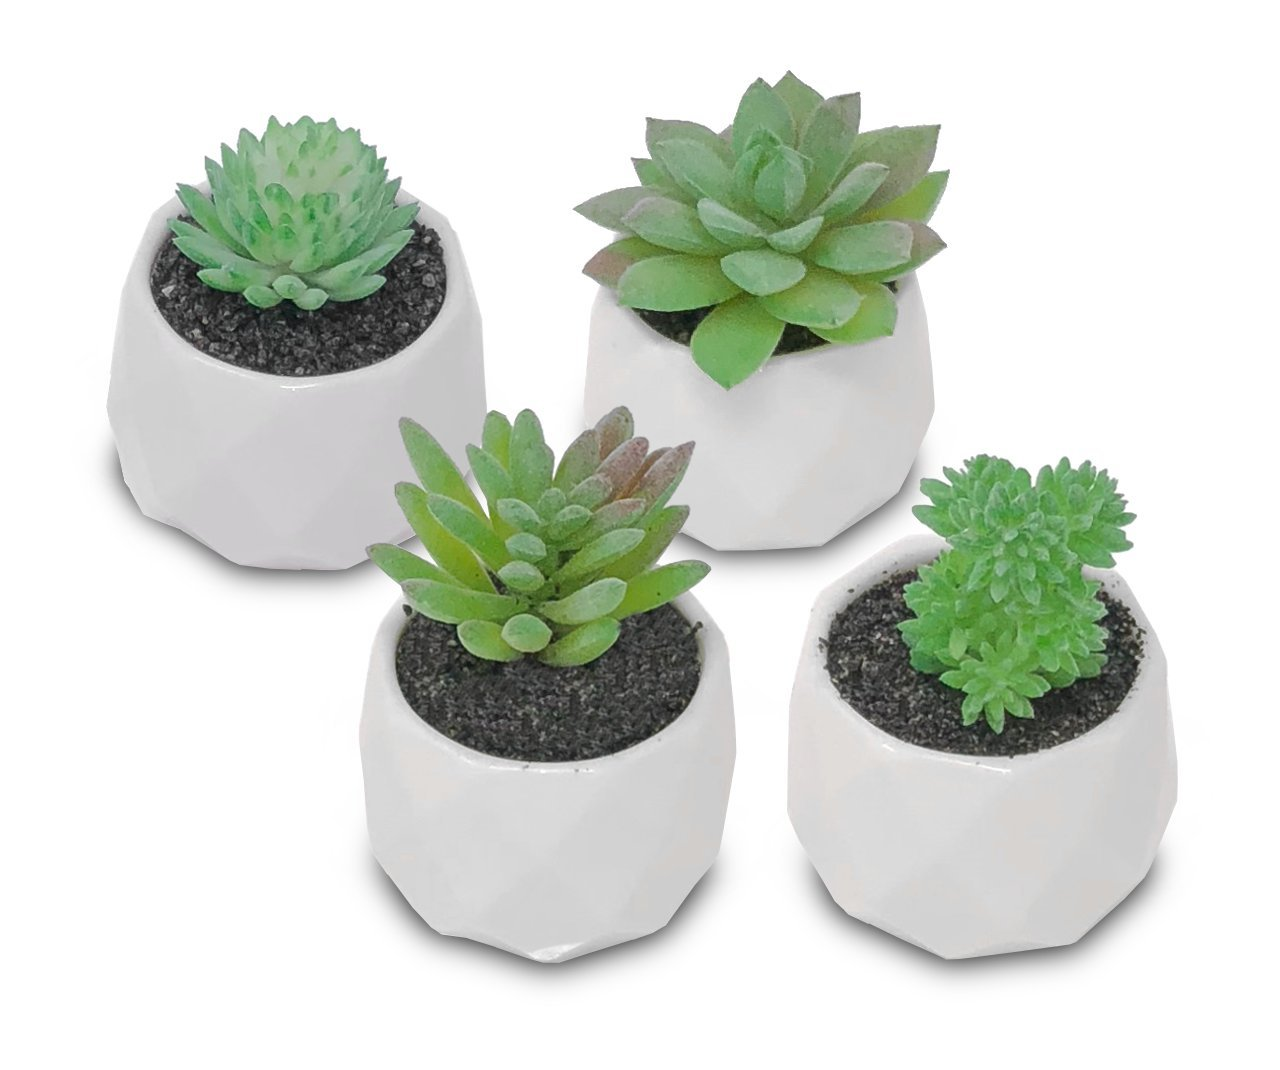 melonluchi Assorted Potted人工多肉植物植物装飾人工フェイクアロエEcheveriaプランターポット、4のセット(ホワイトセラミック) B07CPQT1ZV